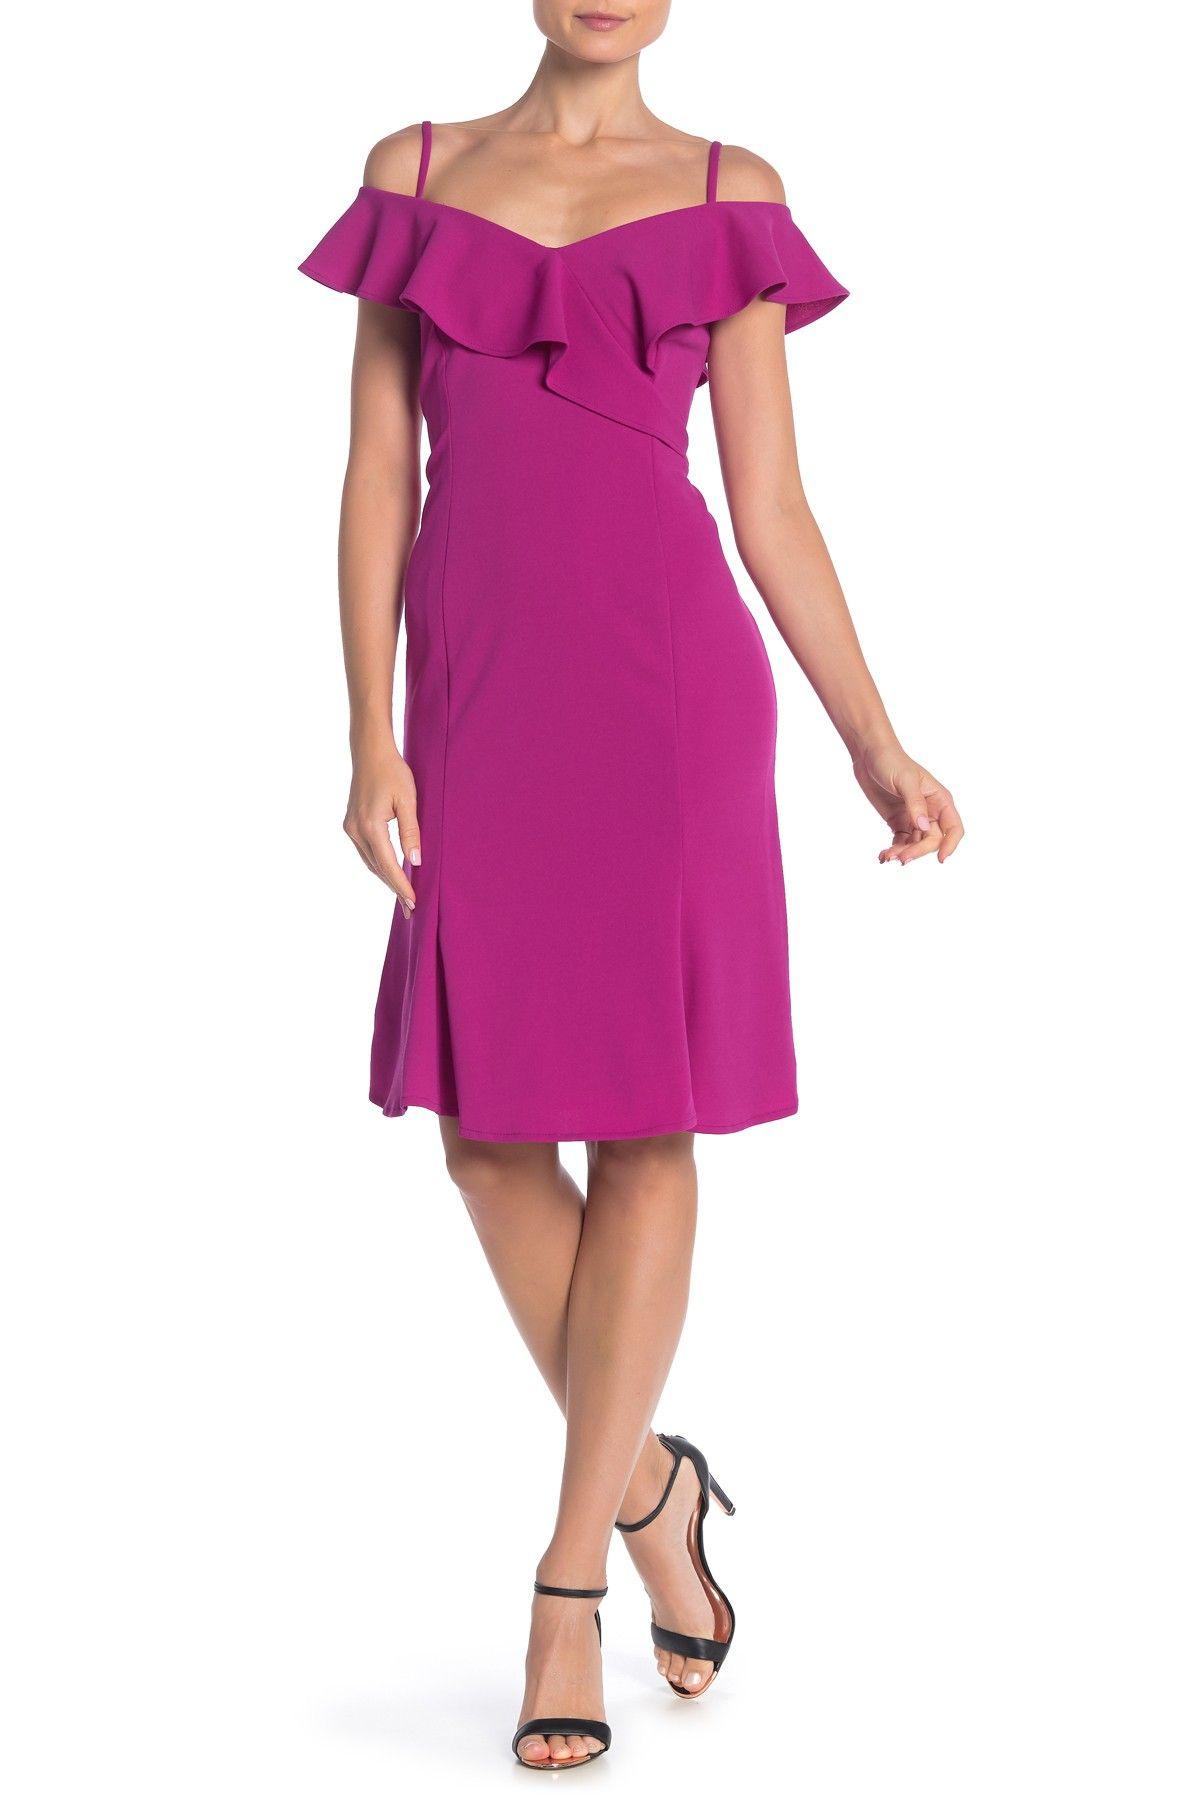 Marina Cold Shoulder Ruffle Trim Crepe Dress Nordstrom Rack Dresses Crepe Dress Stylish Dresses [ 1800 x 1200 Pixel ]